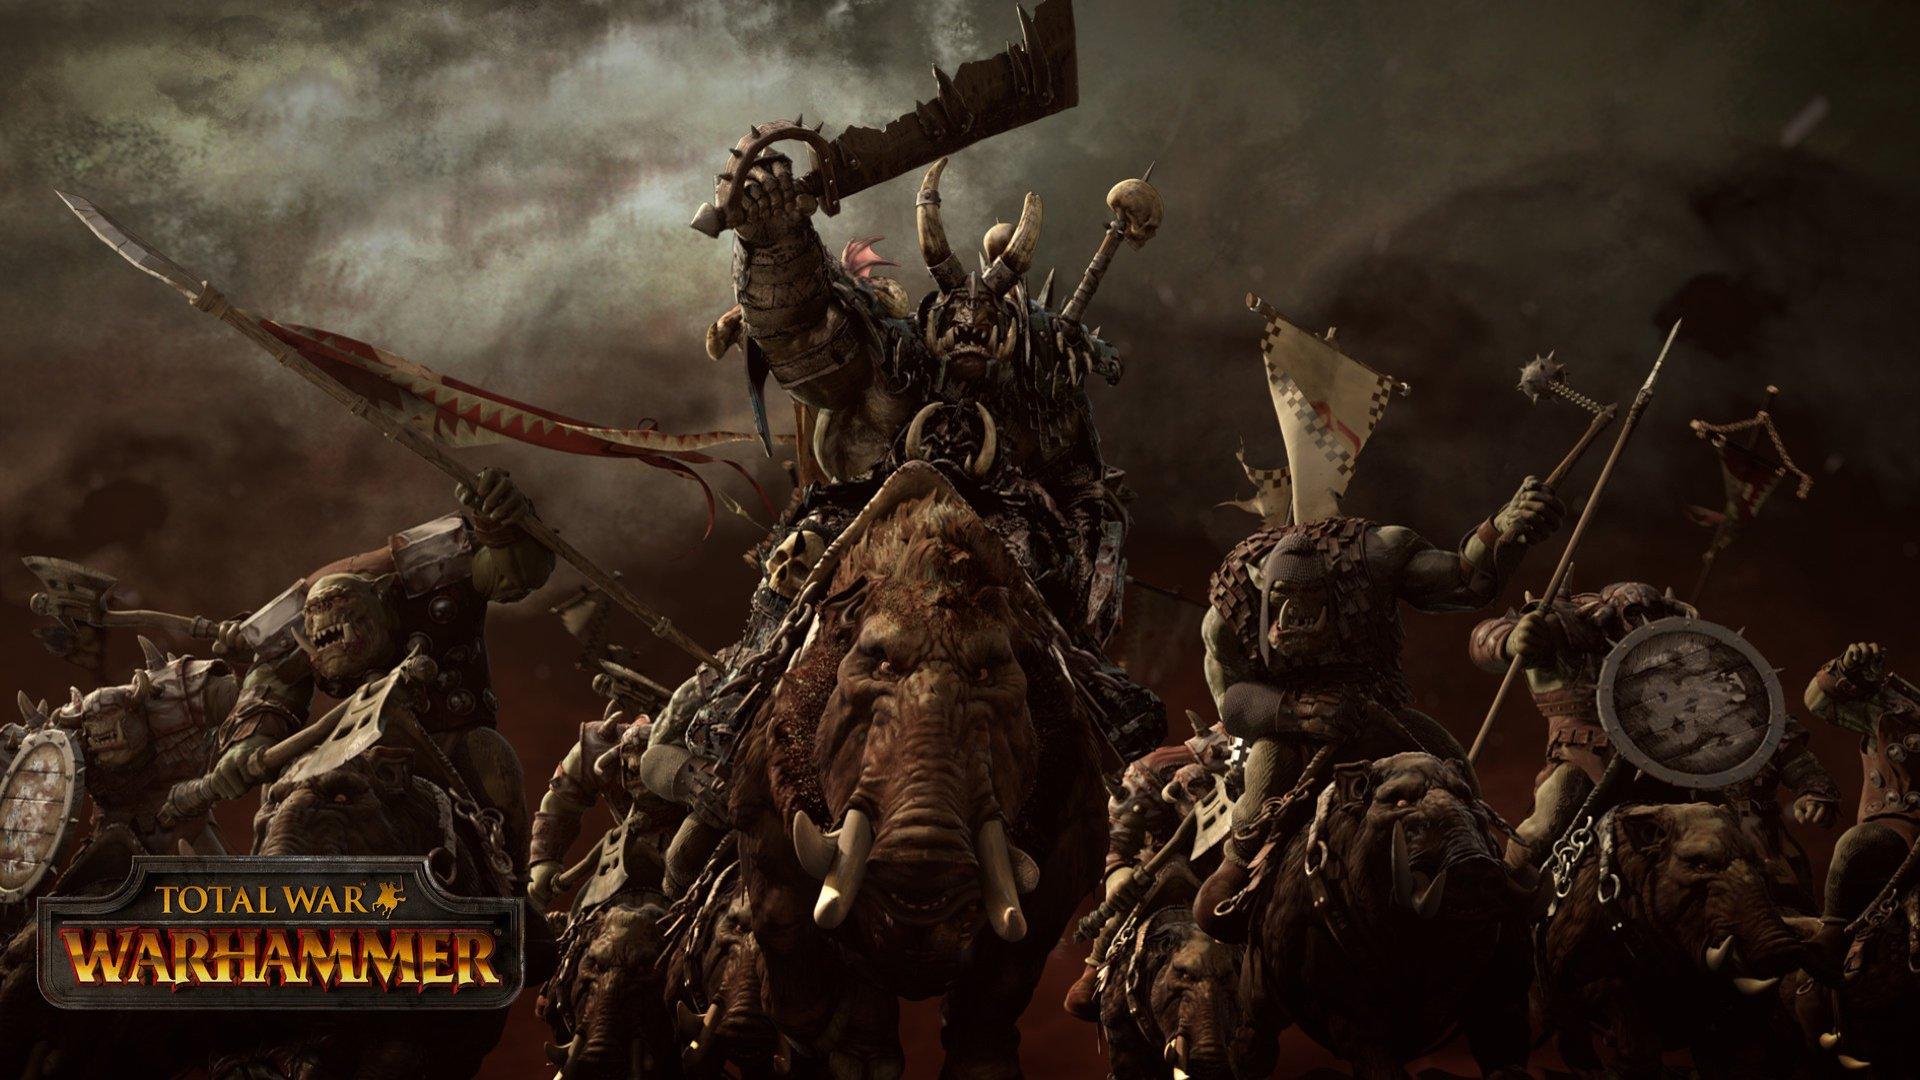 Orcs Total War Warhammer Wallpaper Games HD Wallpapers 1920x1080